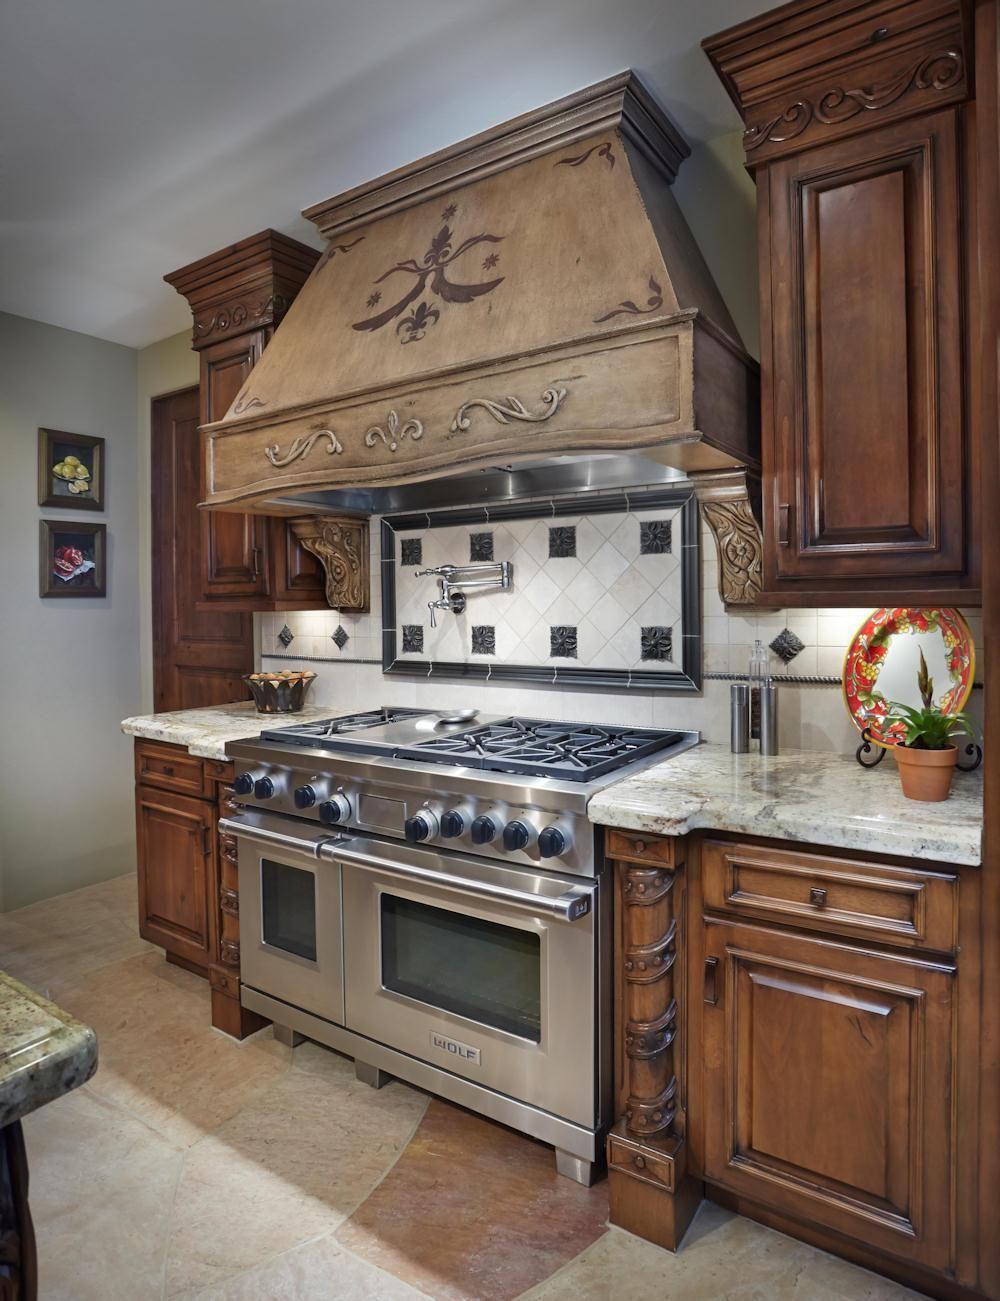 Perfect Kitchens Tucson Traditional Kitchen Design Traditional Kitchen